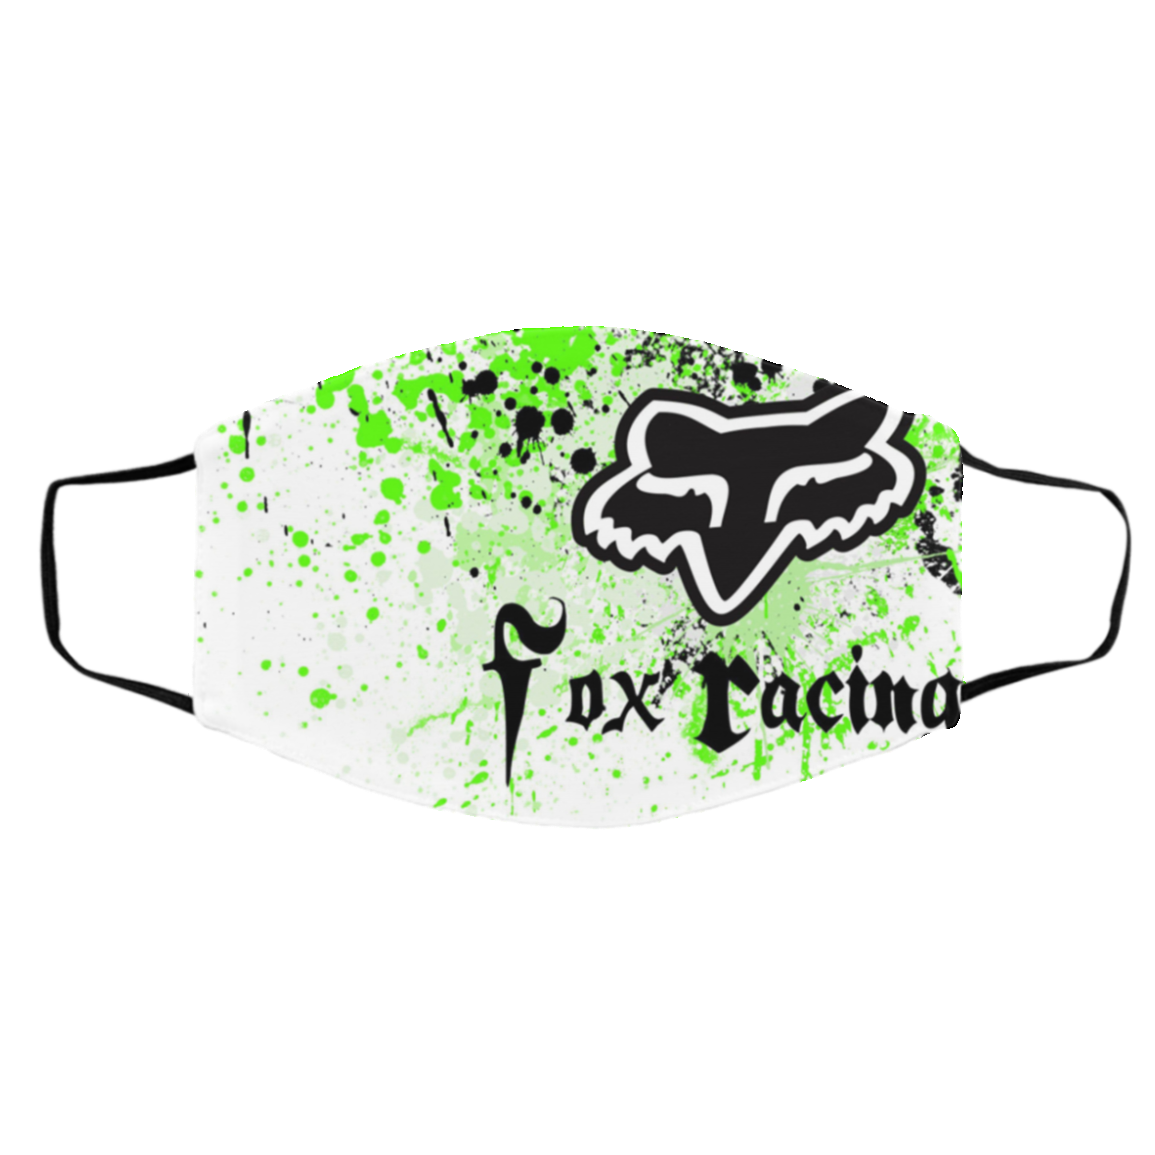 Bab-y Yo-da F-ox Racing Motor Extr-eme Sports B-MX- Face Mask